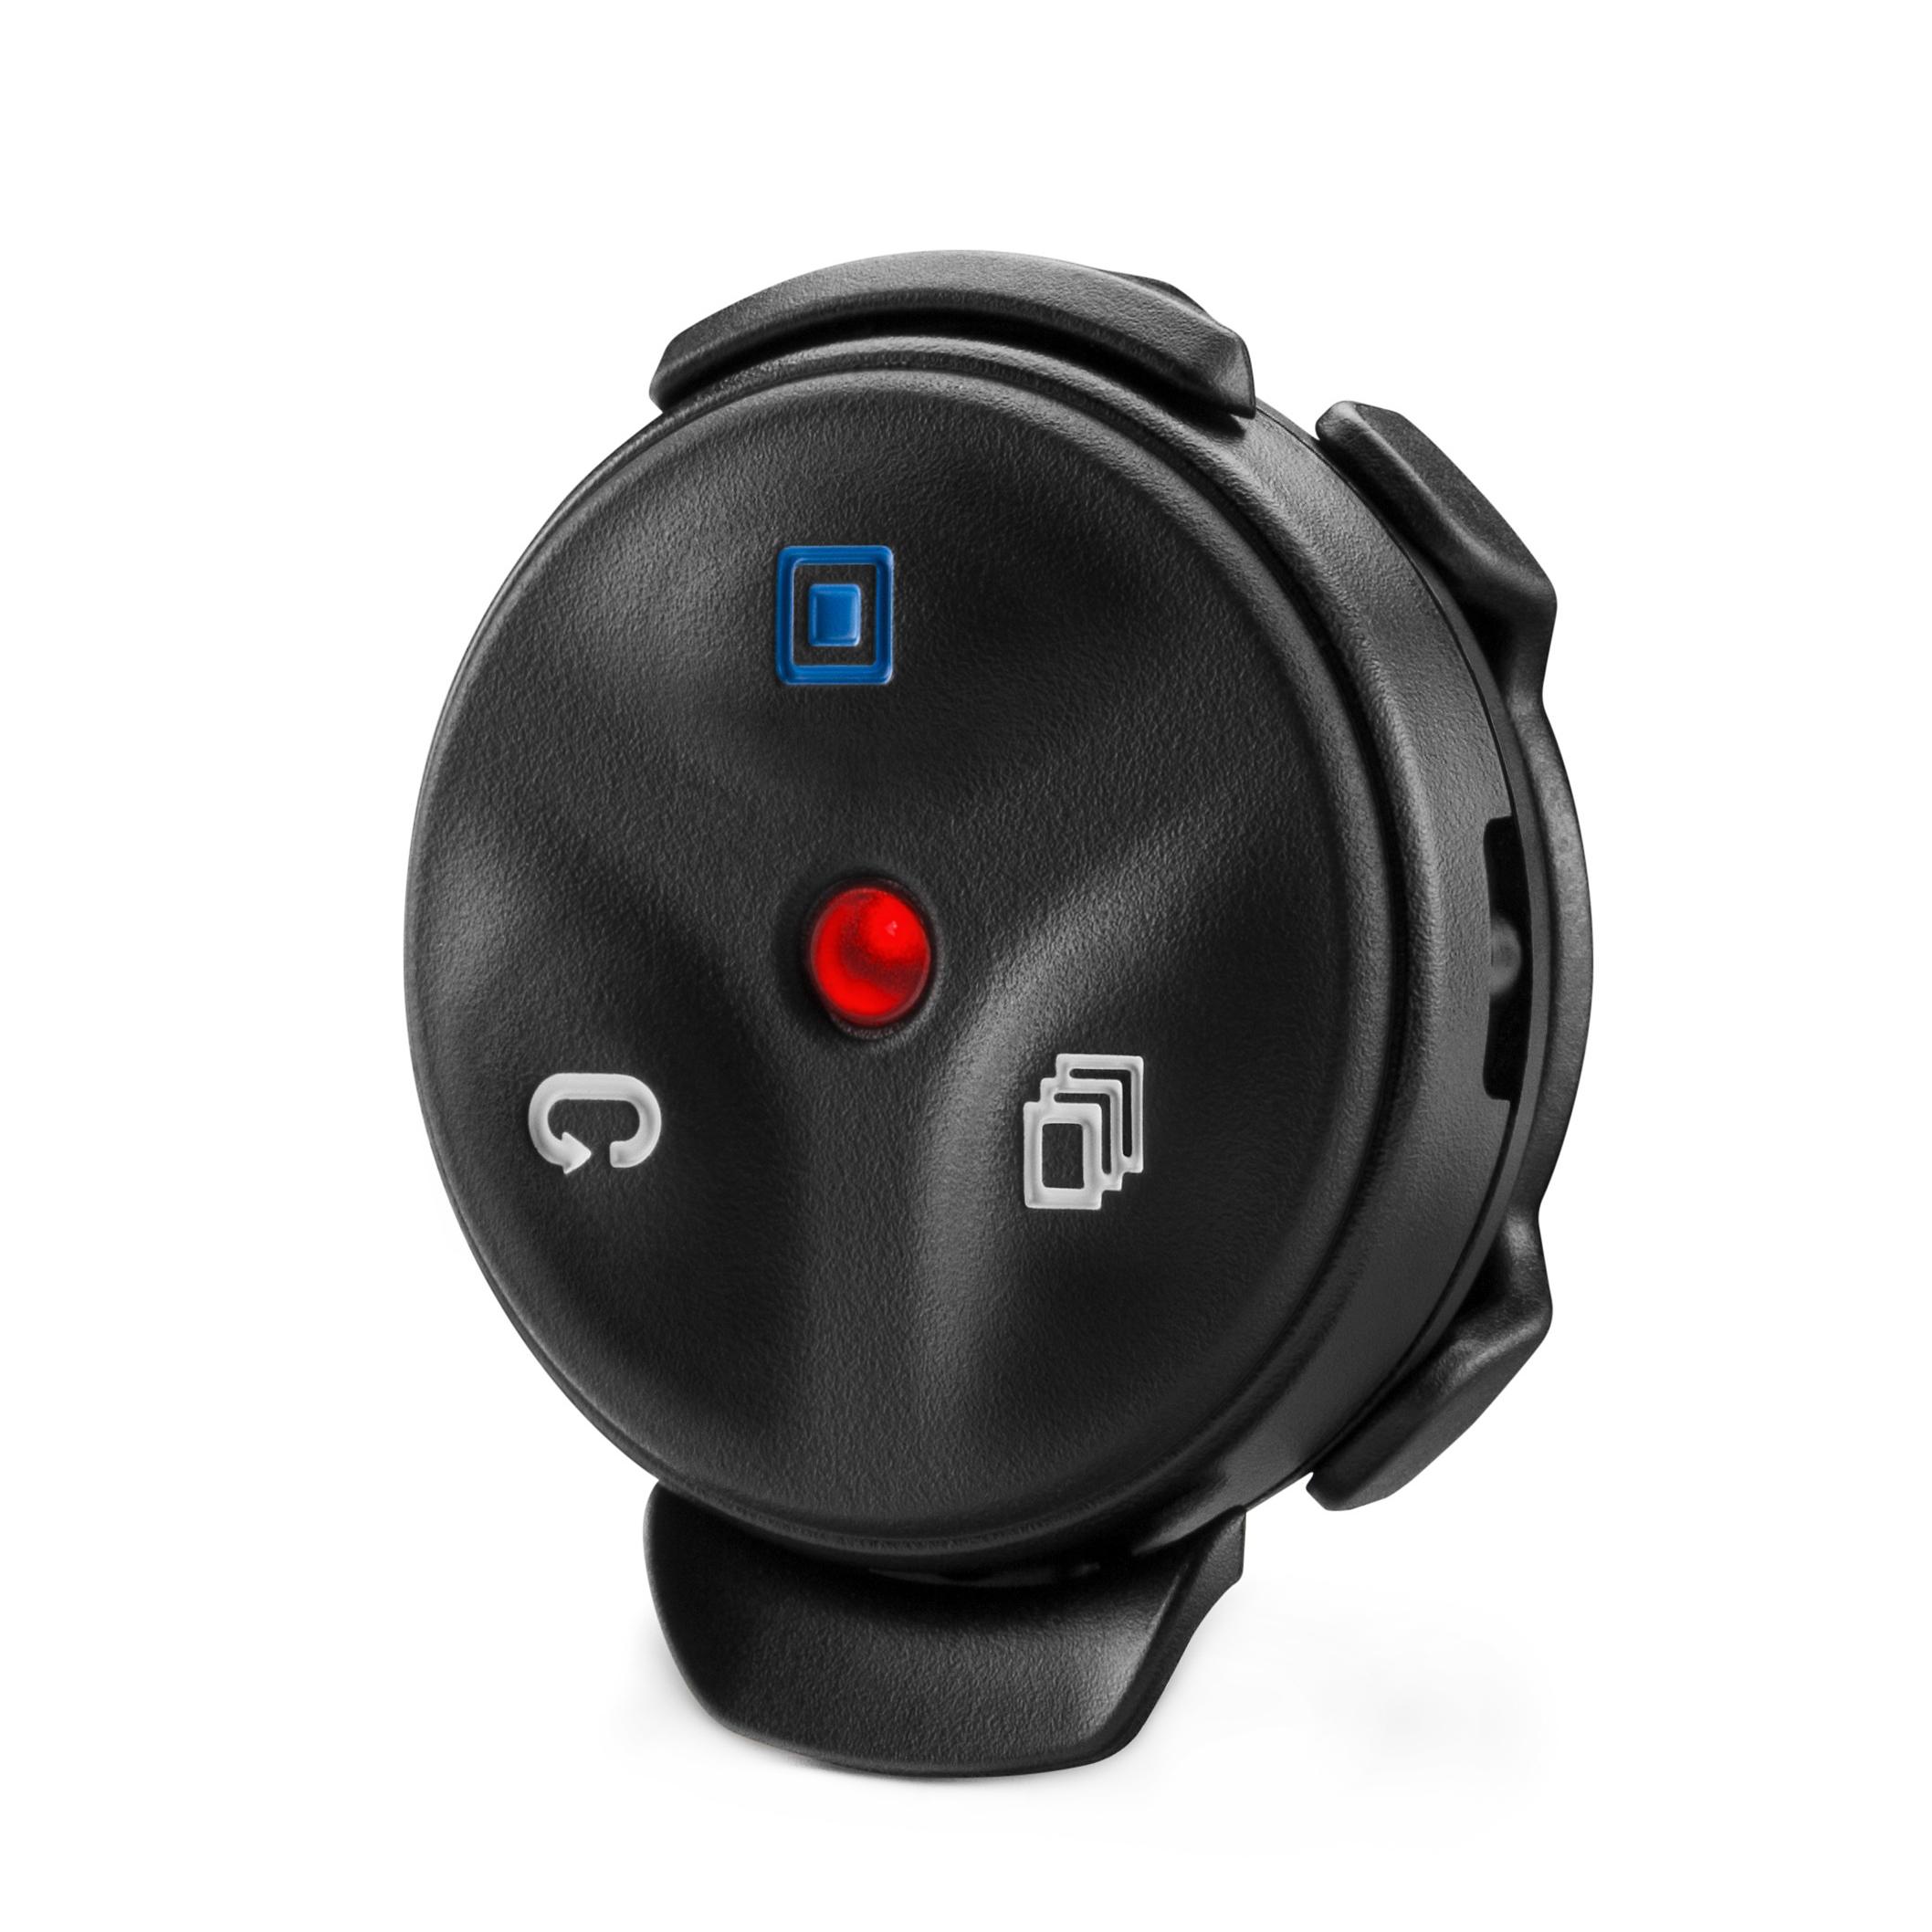 Garmin Edge Remote Control for Edge 1000 with Ant  Wireless Connectivity Black